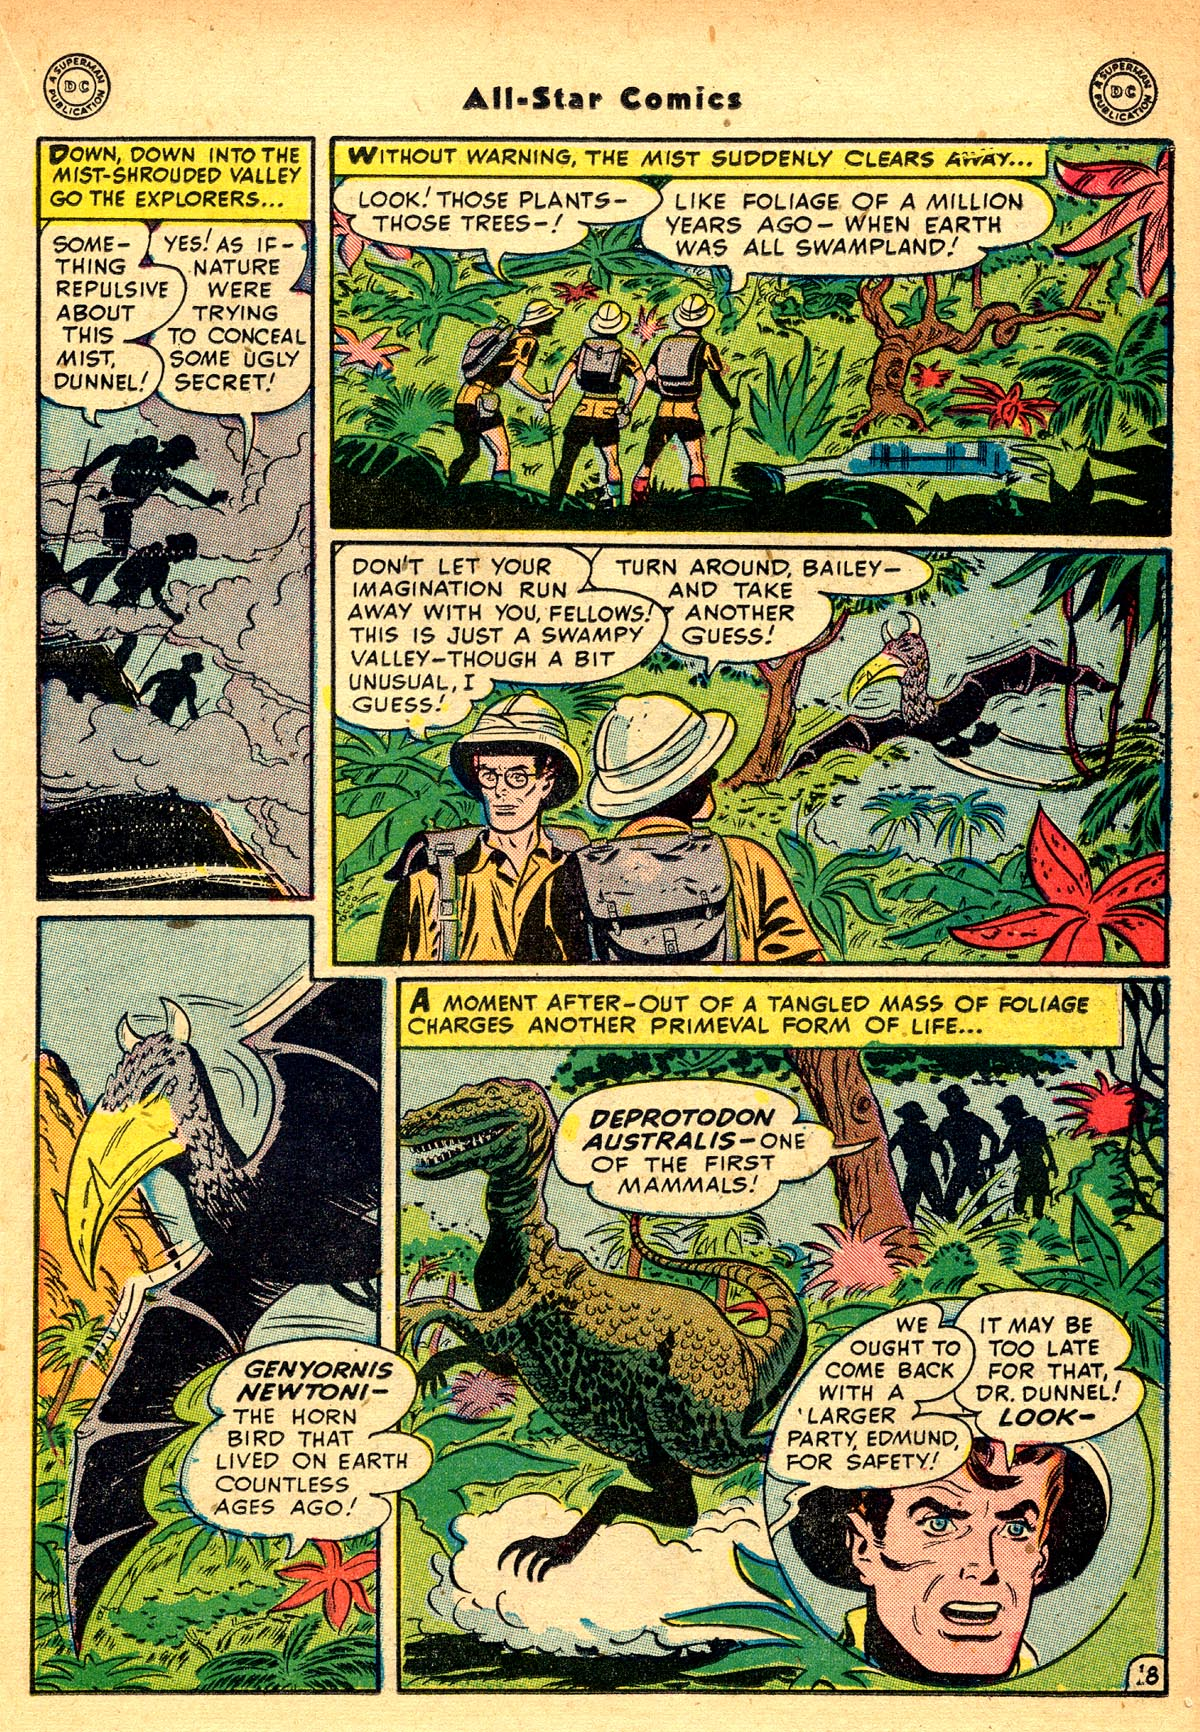 Read online All-Star Comics comic -  Issue #48 - 21